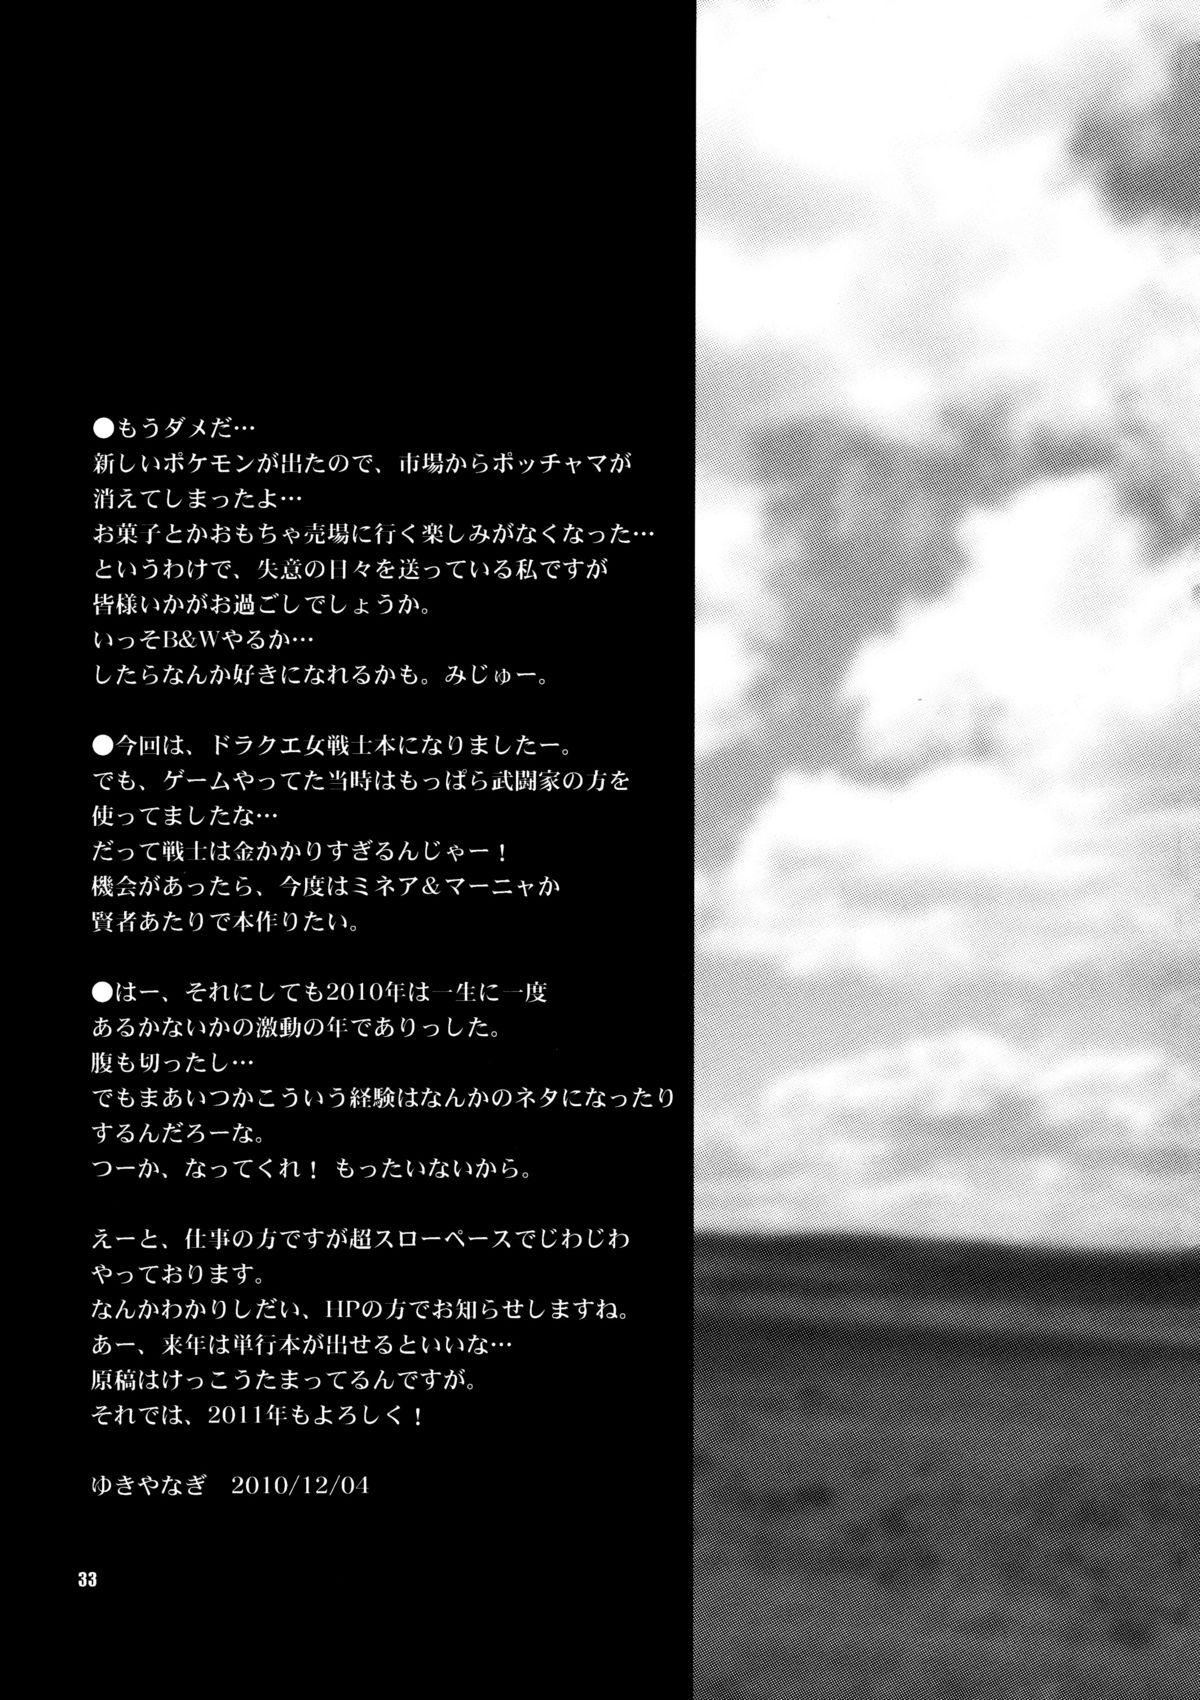 Onna Senshi to Sekai no Unmei | Female Warrior and Fate of the World 30